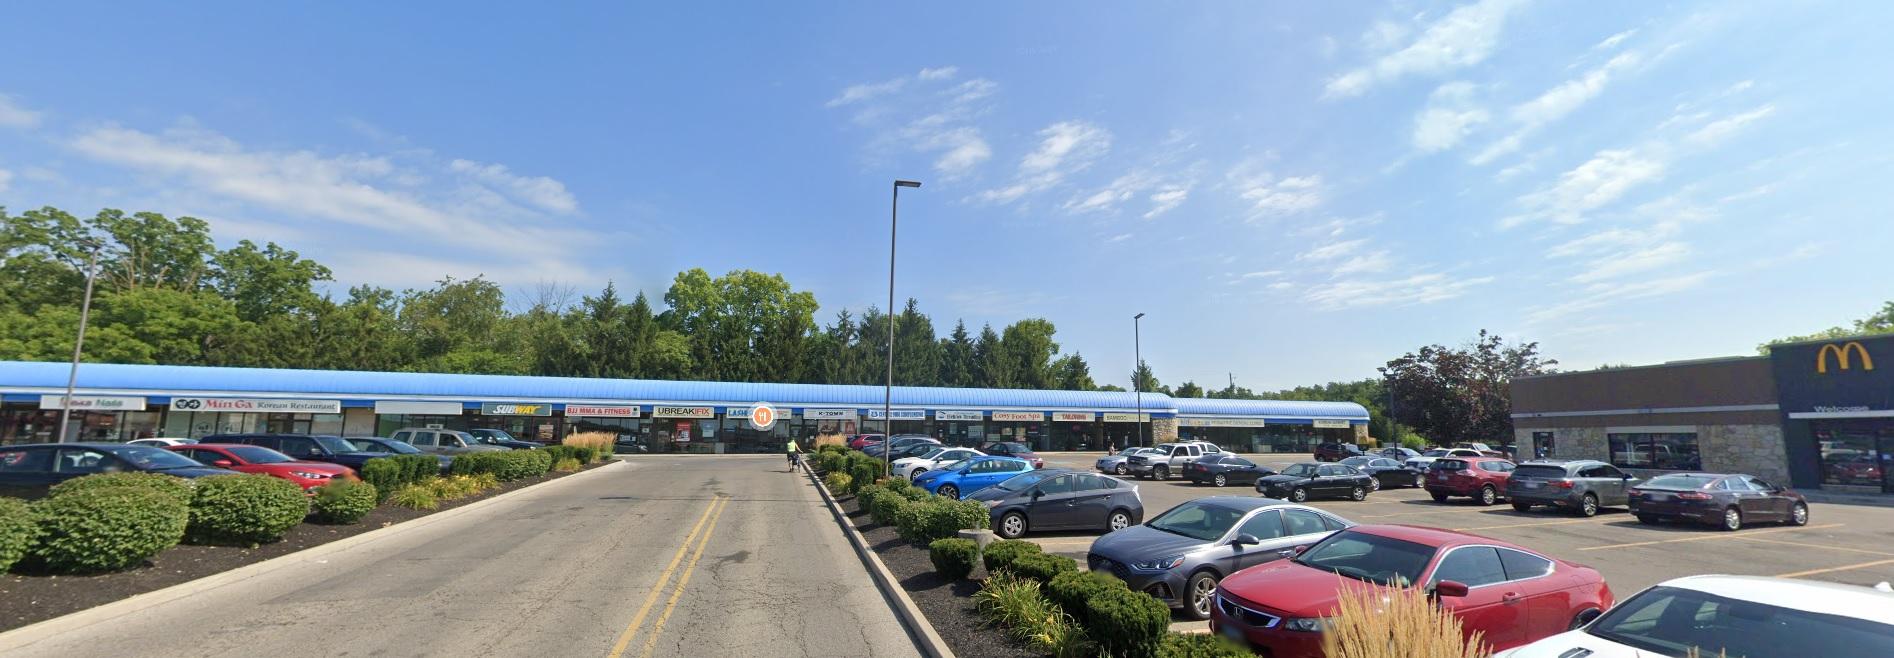 Bethel Shopping Center